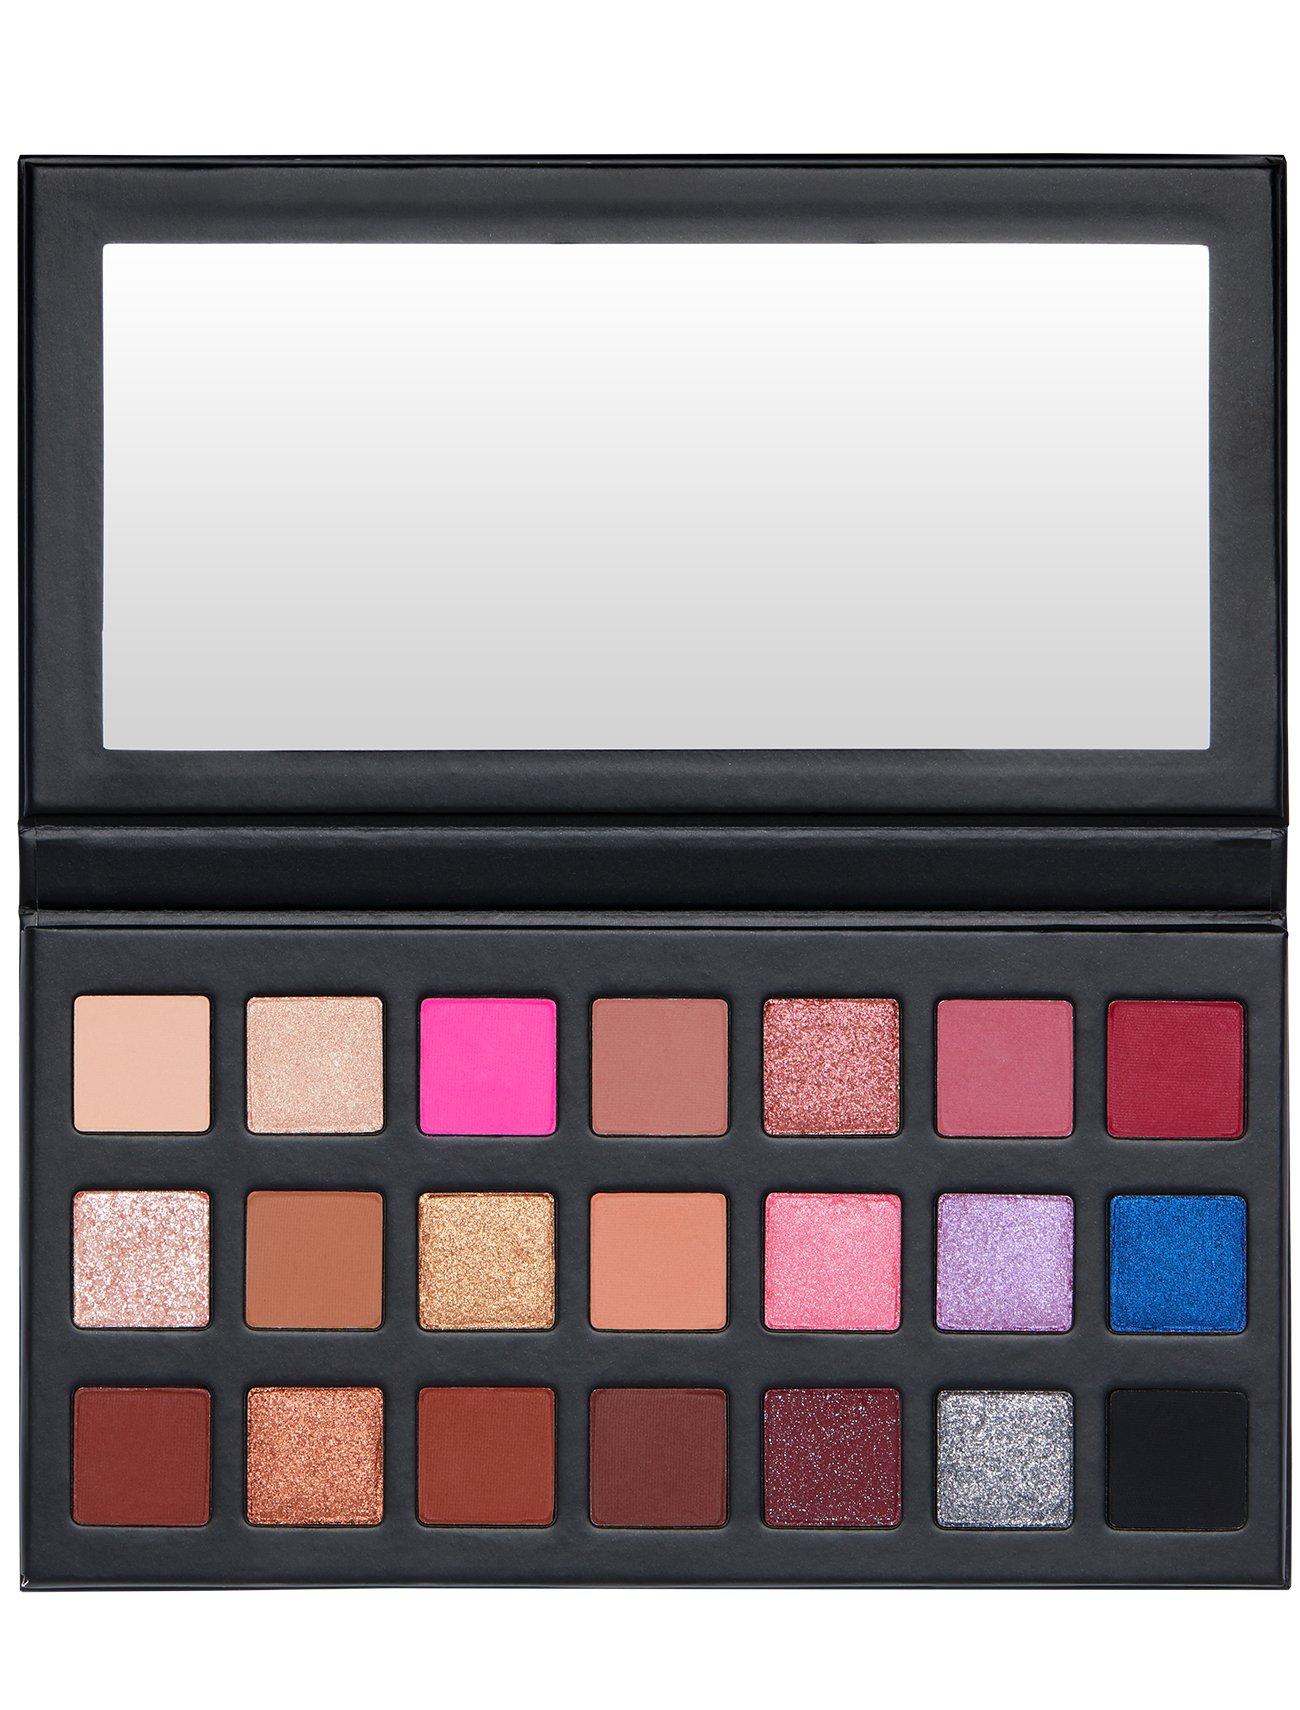 Kylie Cosmetics Birthday 2018 Palette